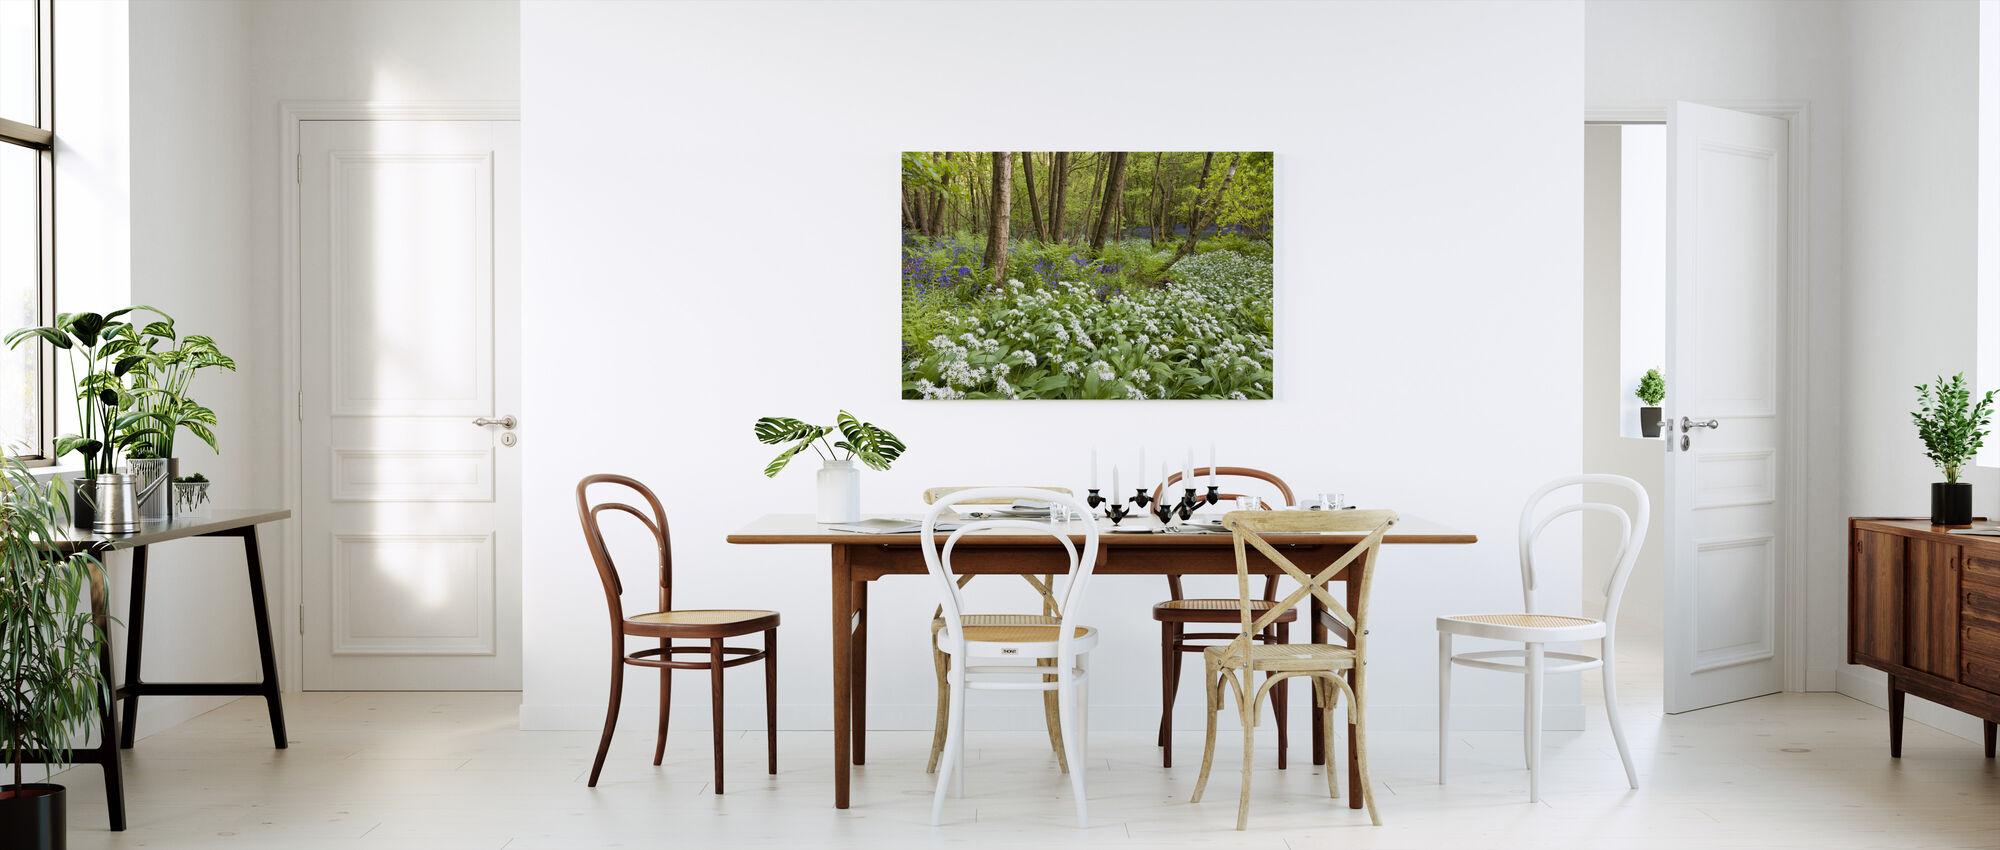 Bear Garlic and Bluebells - Canvas print - Kitchen